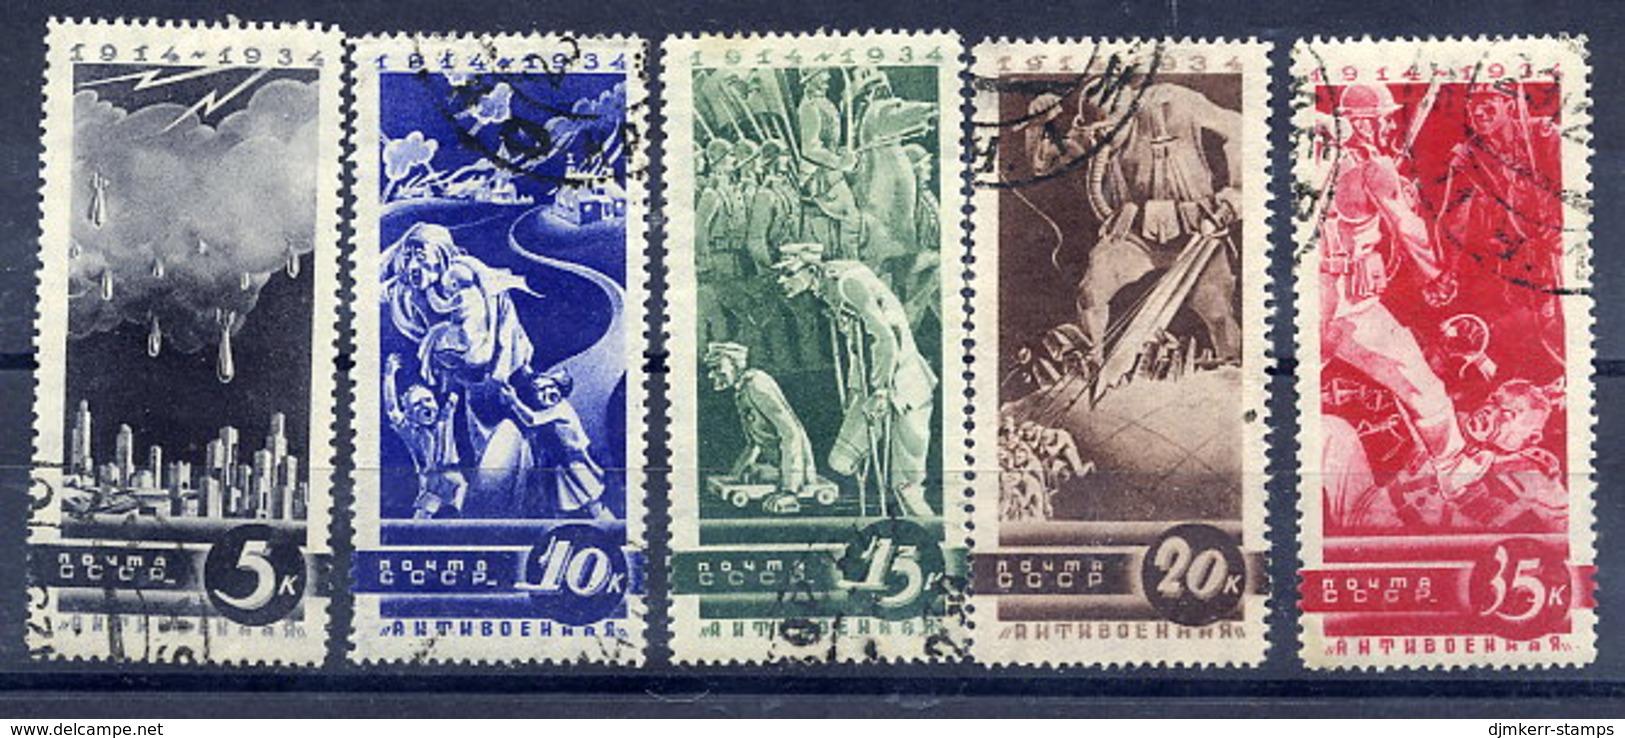 SOVIET UNION 1935 Anti-war Propaganda Set Used.  Michel 494-98 - Used Stamps